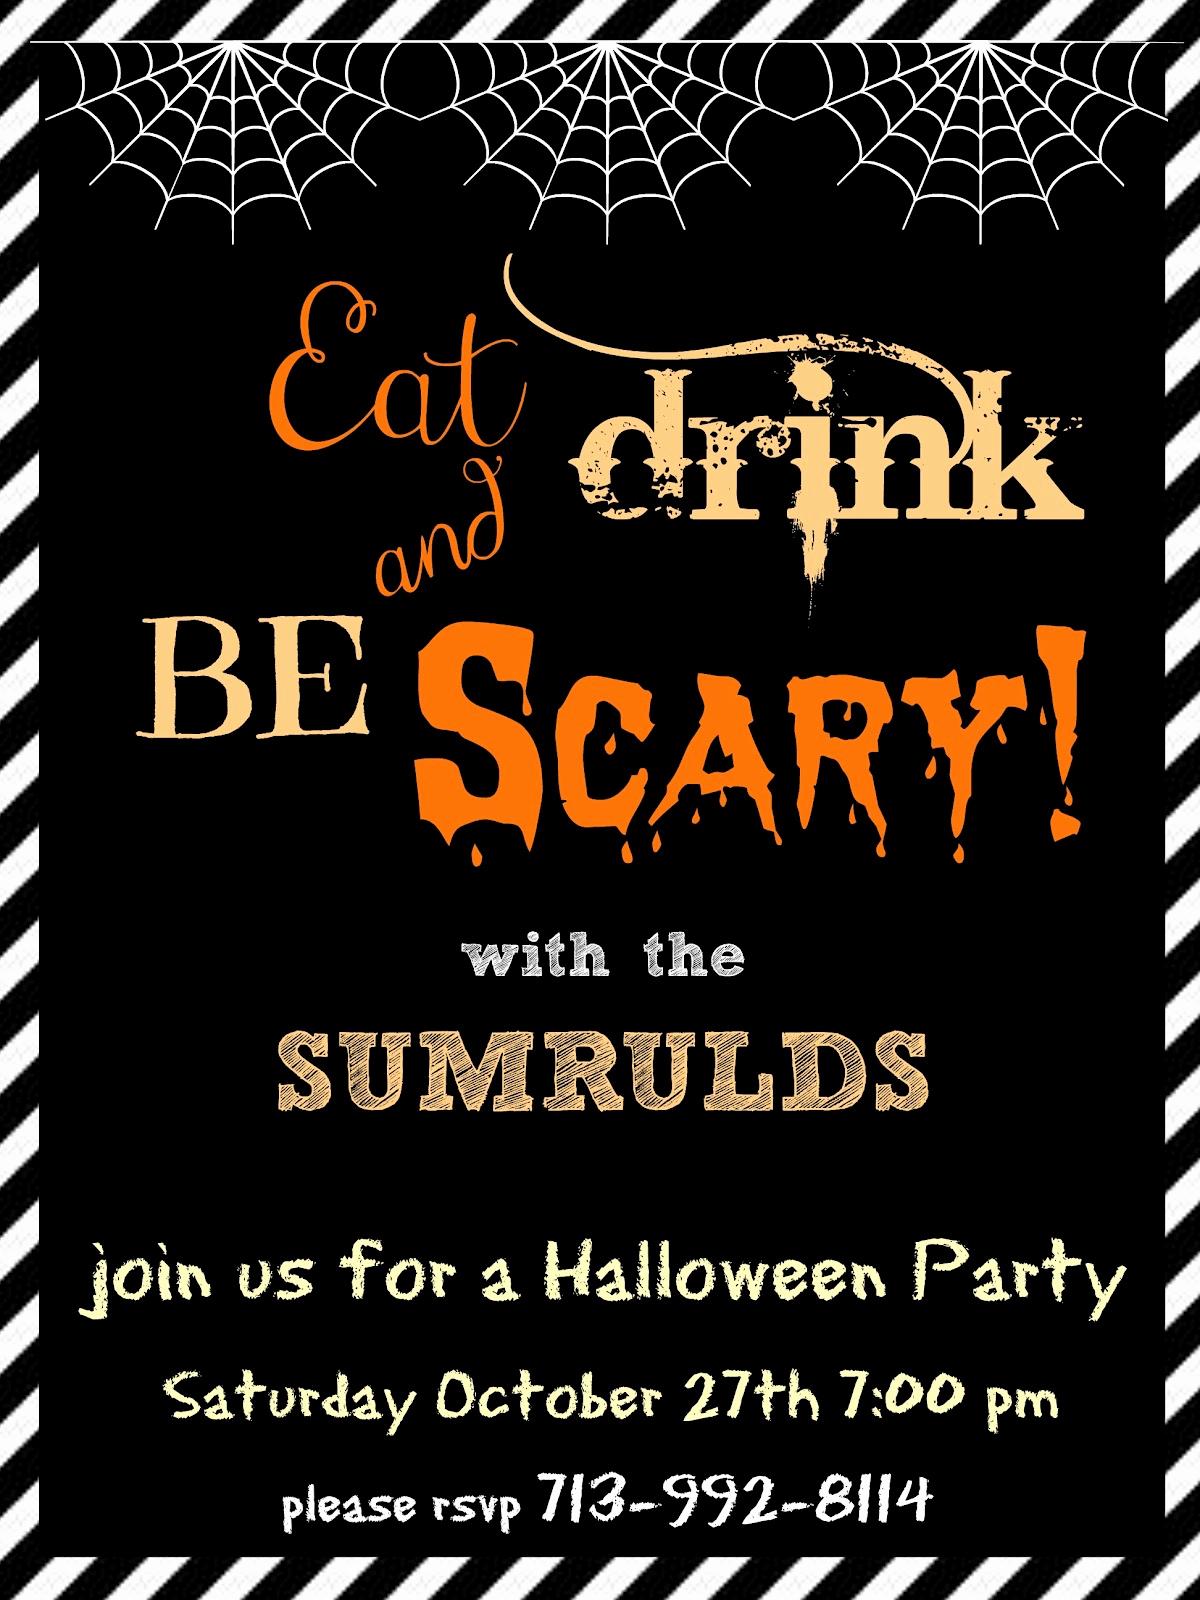 Free Halloween Party Invitation Templates Luxury Halloween Party Invitation Templates Free – Festival